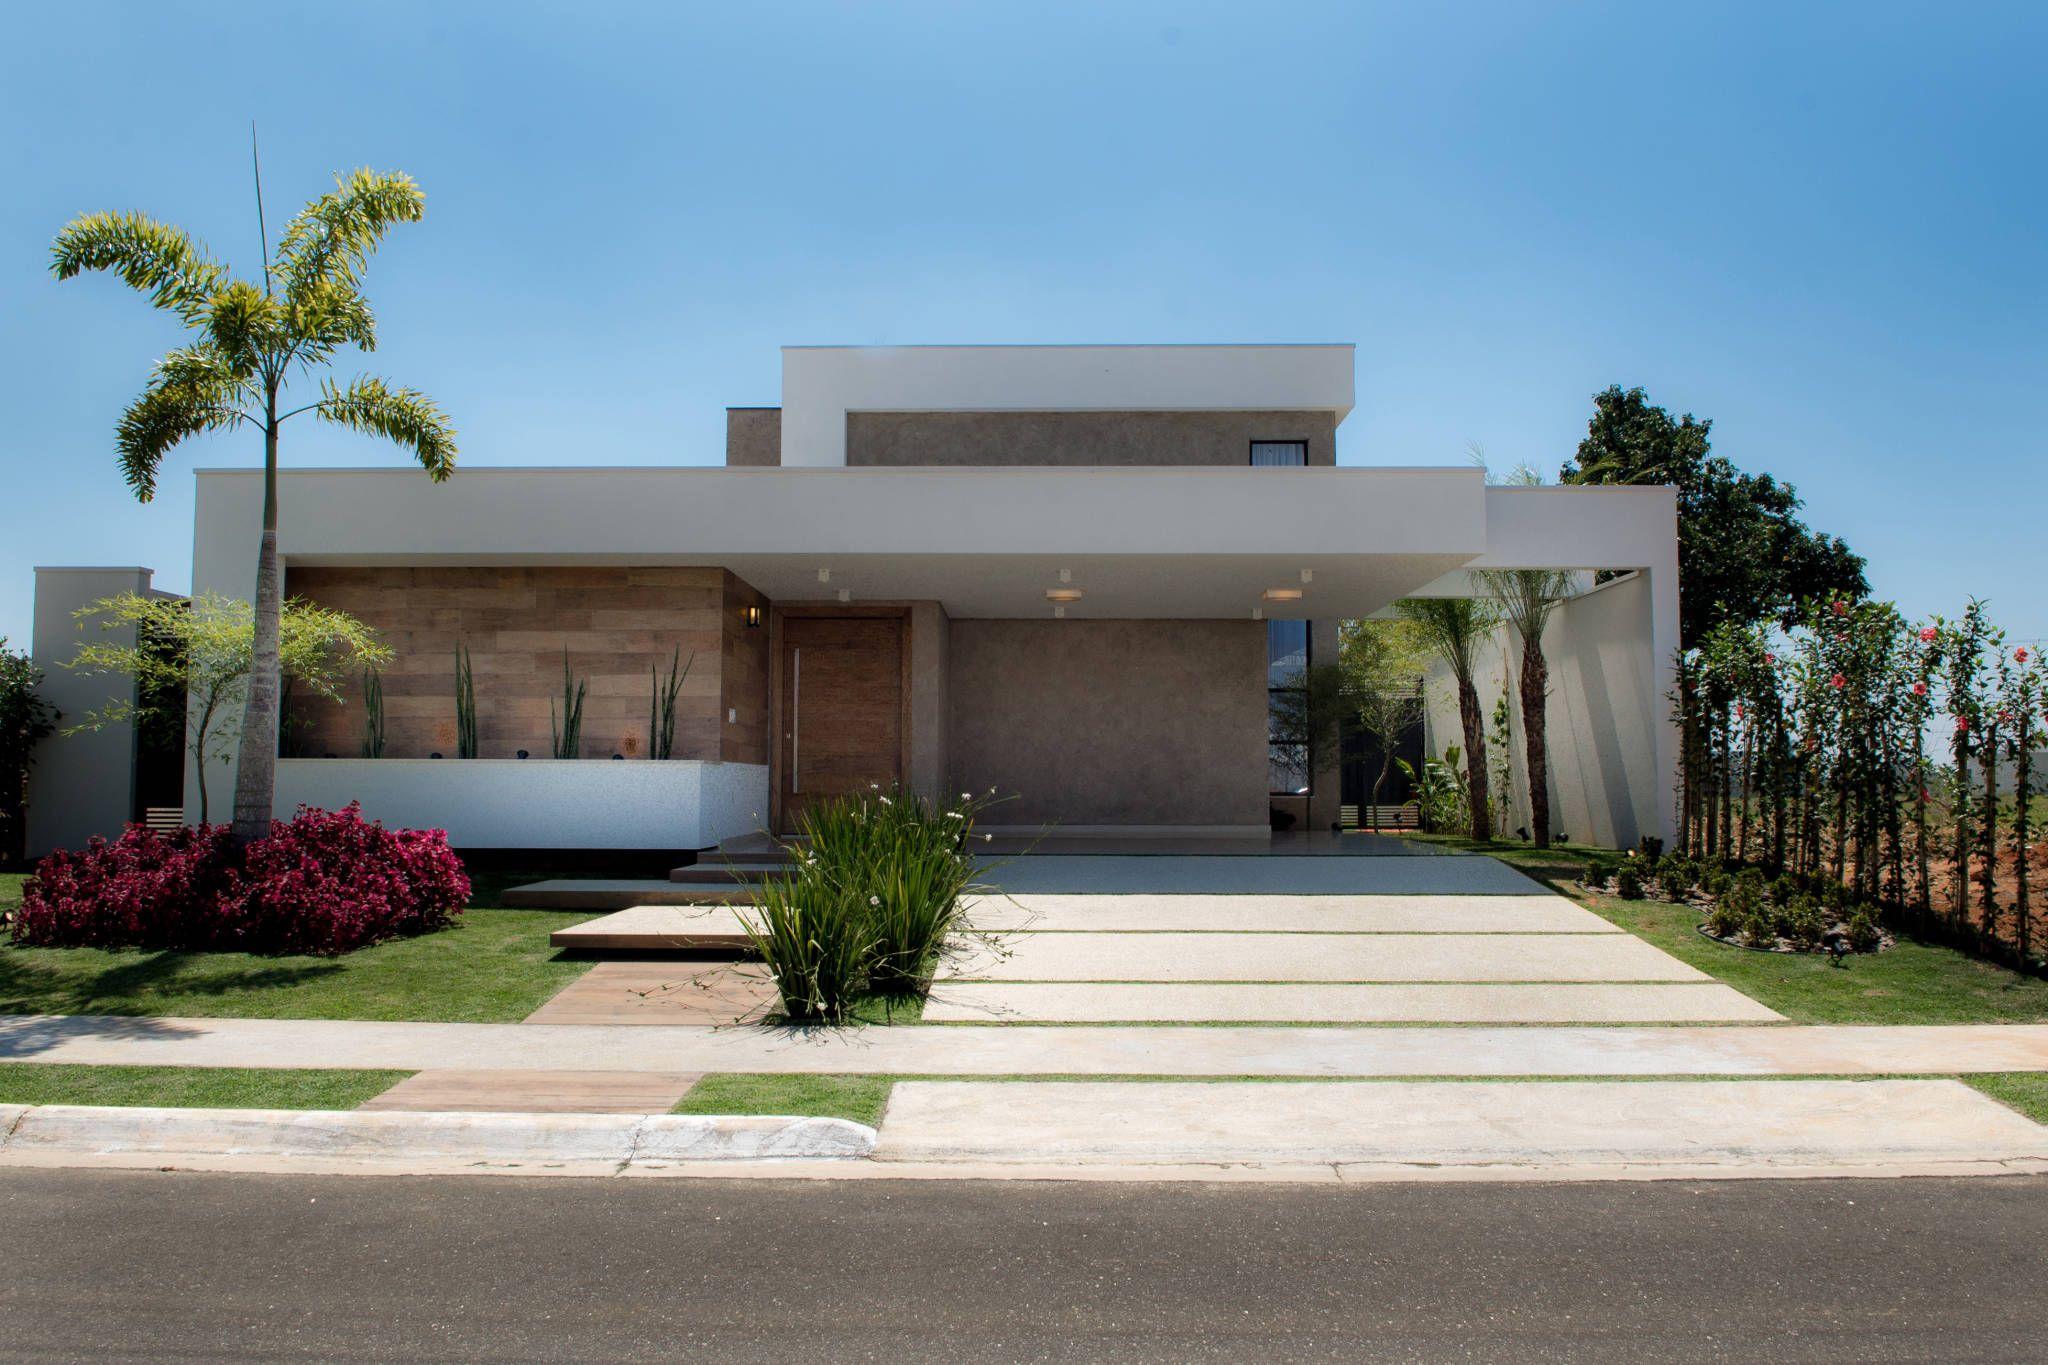 Casa Terrea Contemporanea Casas Modernas Por Camila Castilho